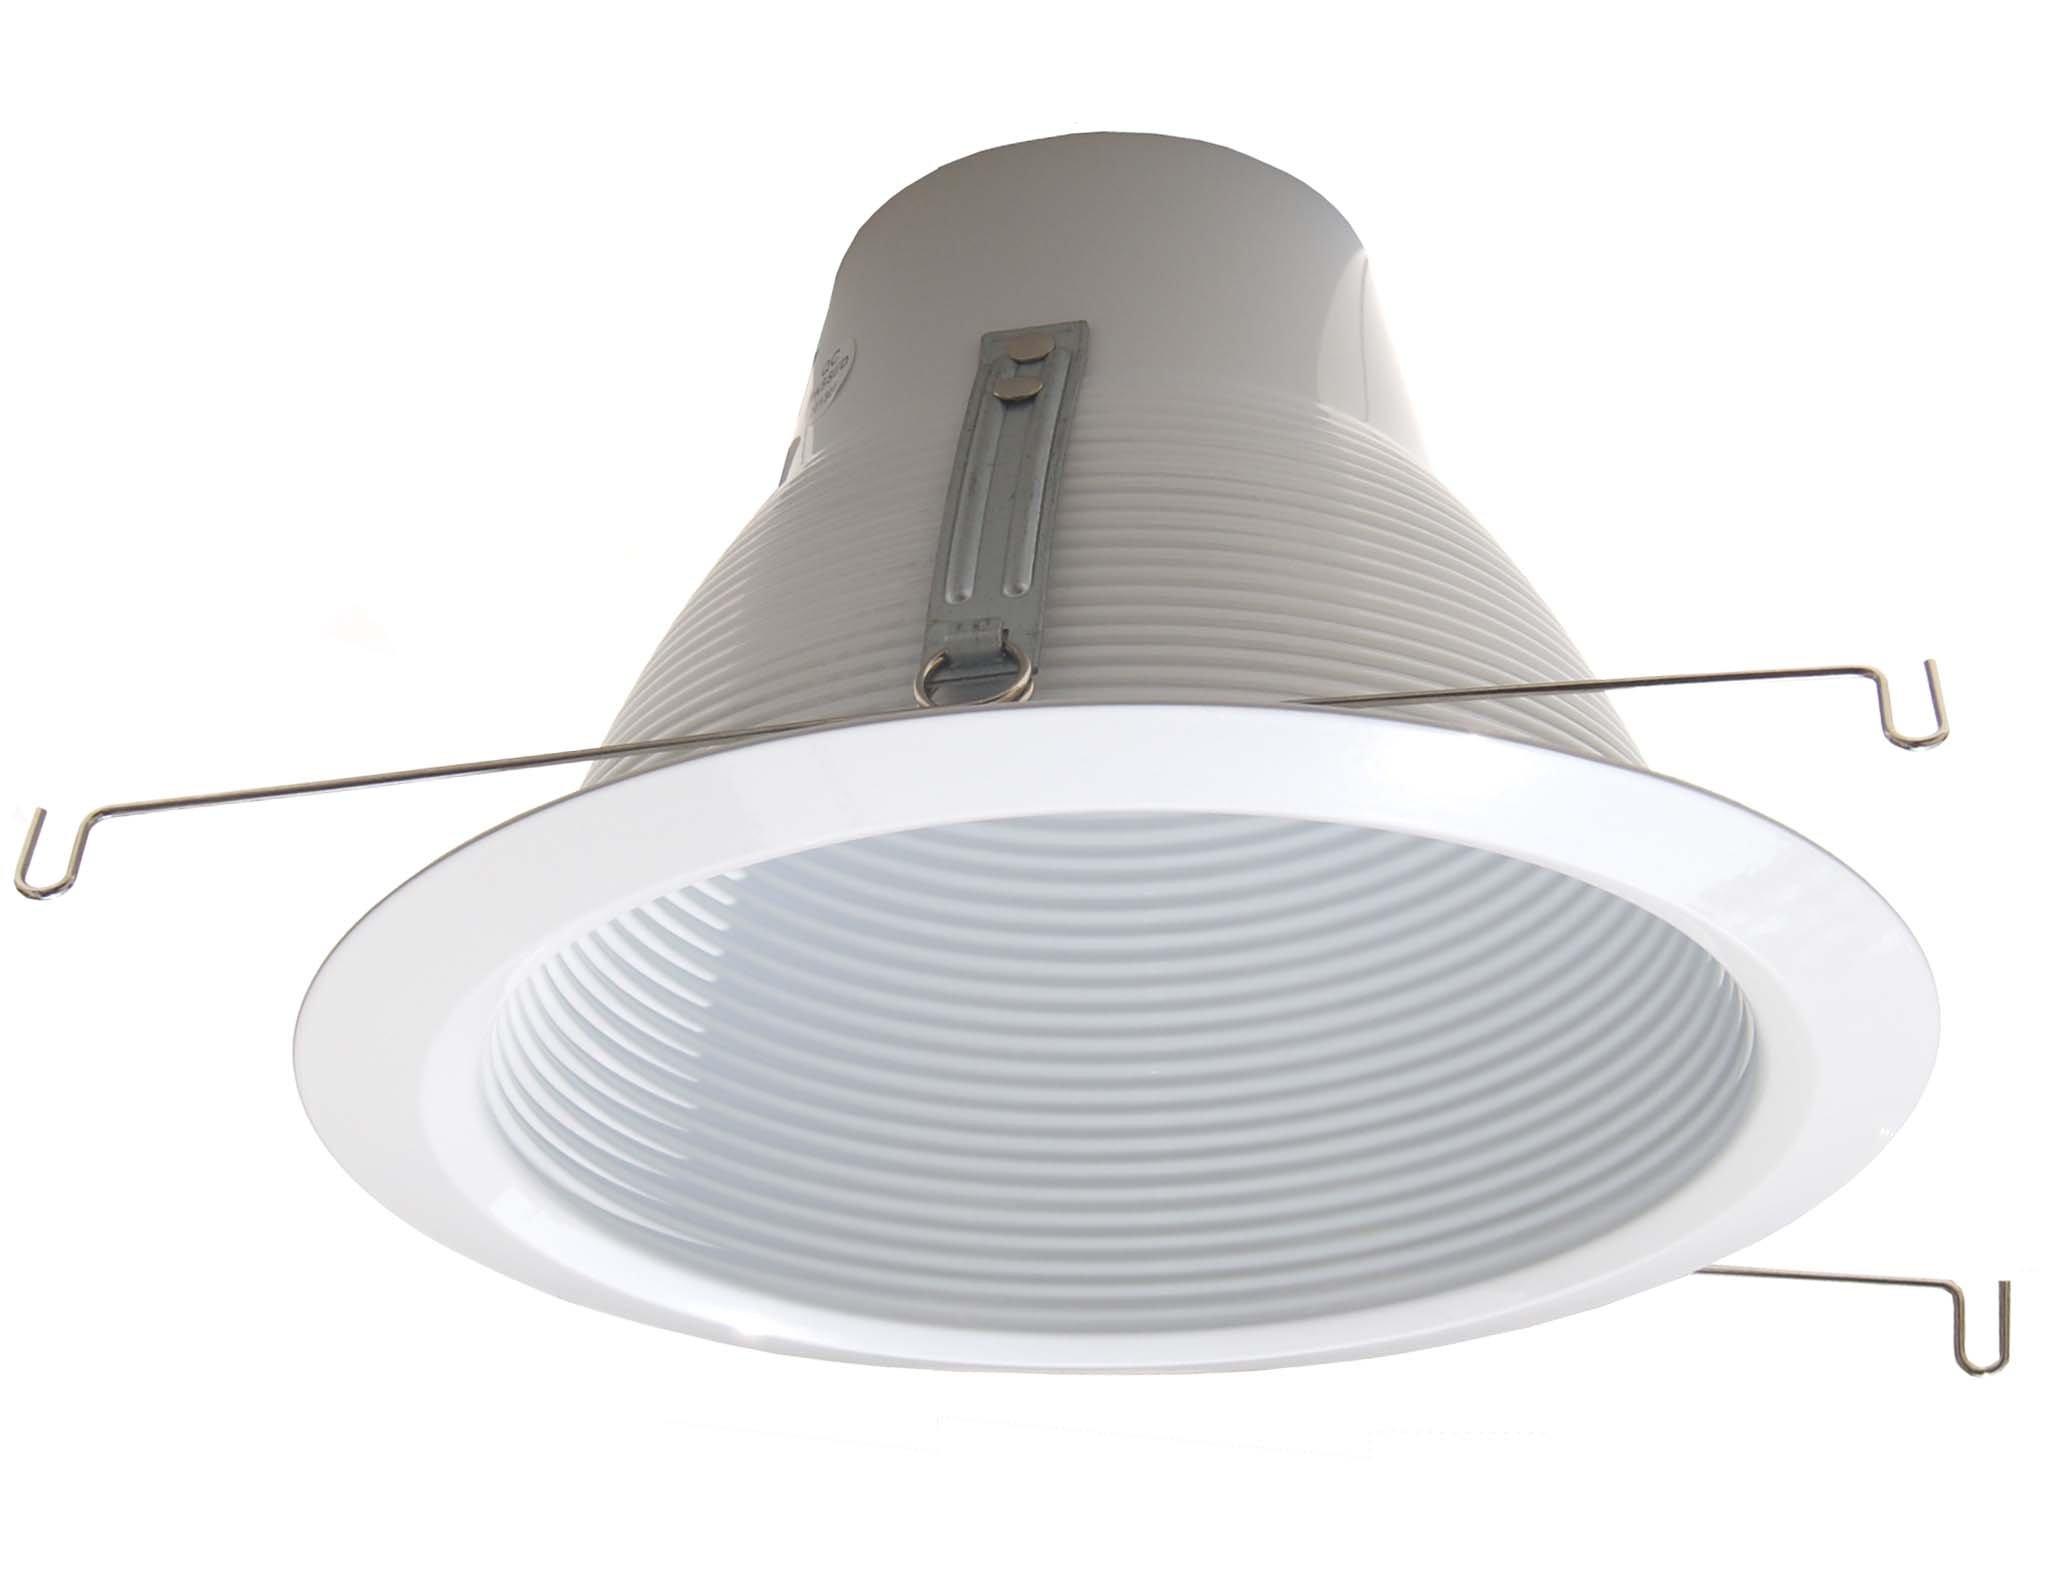 6-Pack--6'' Deep Self Flange Air-Shut Baffle Trim For Line Voltage Recessed Light-White